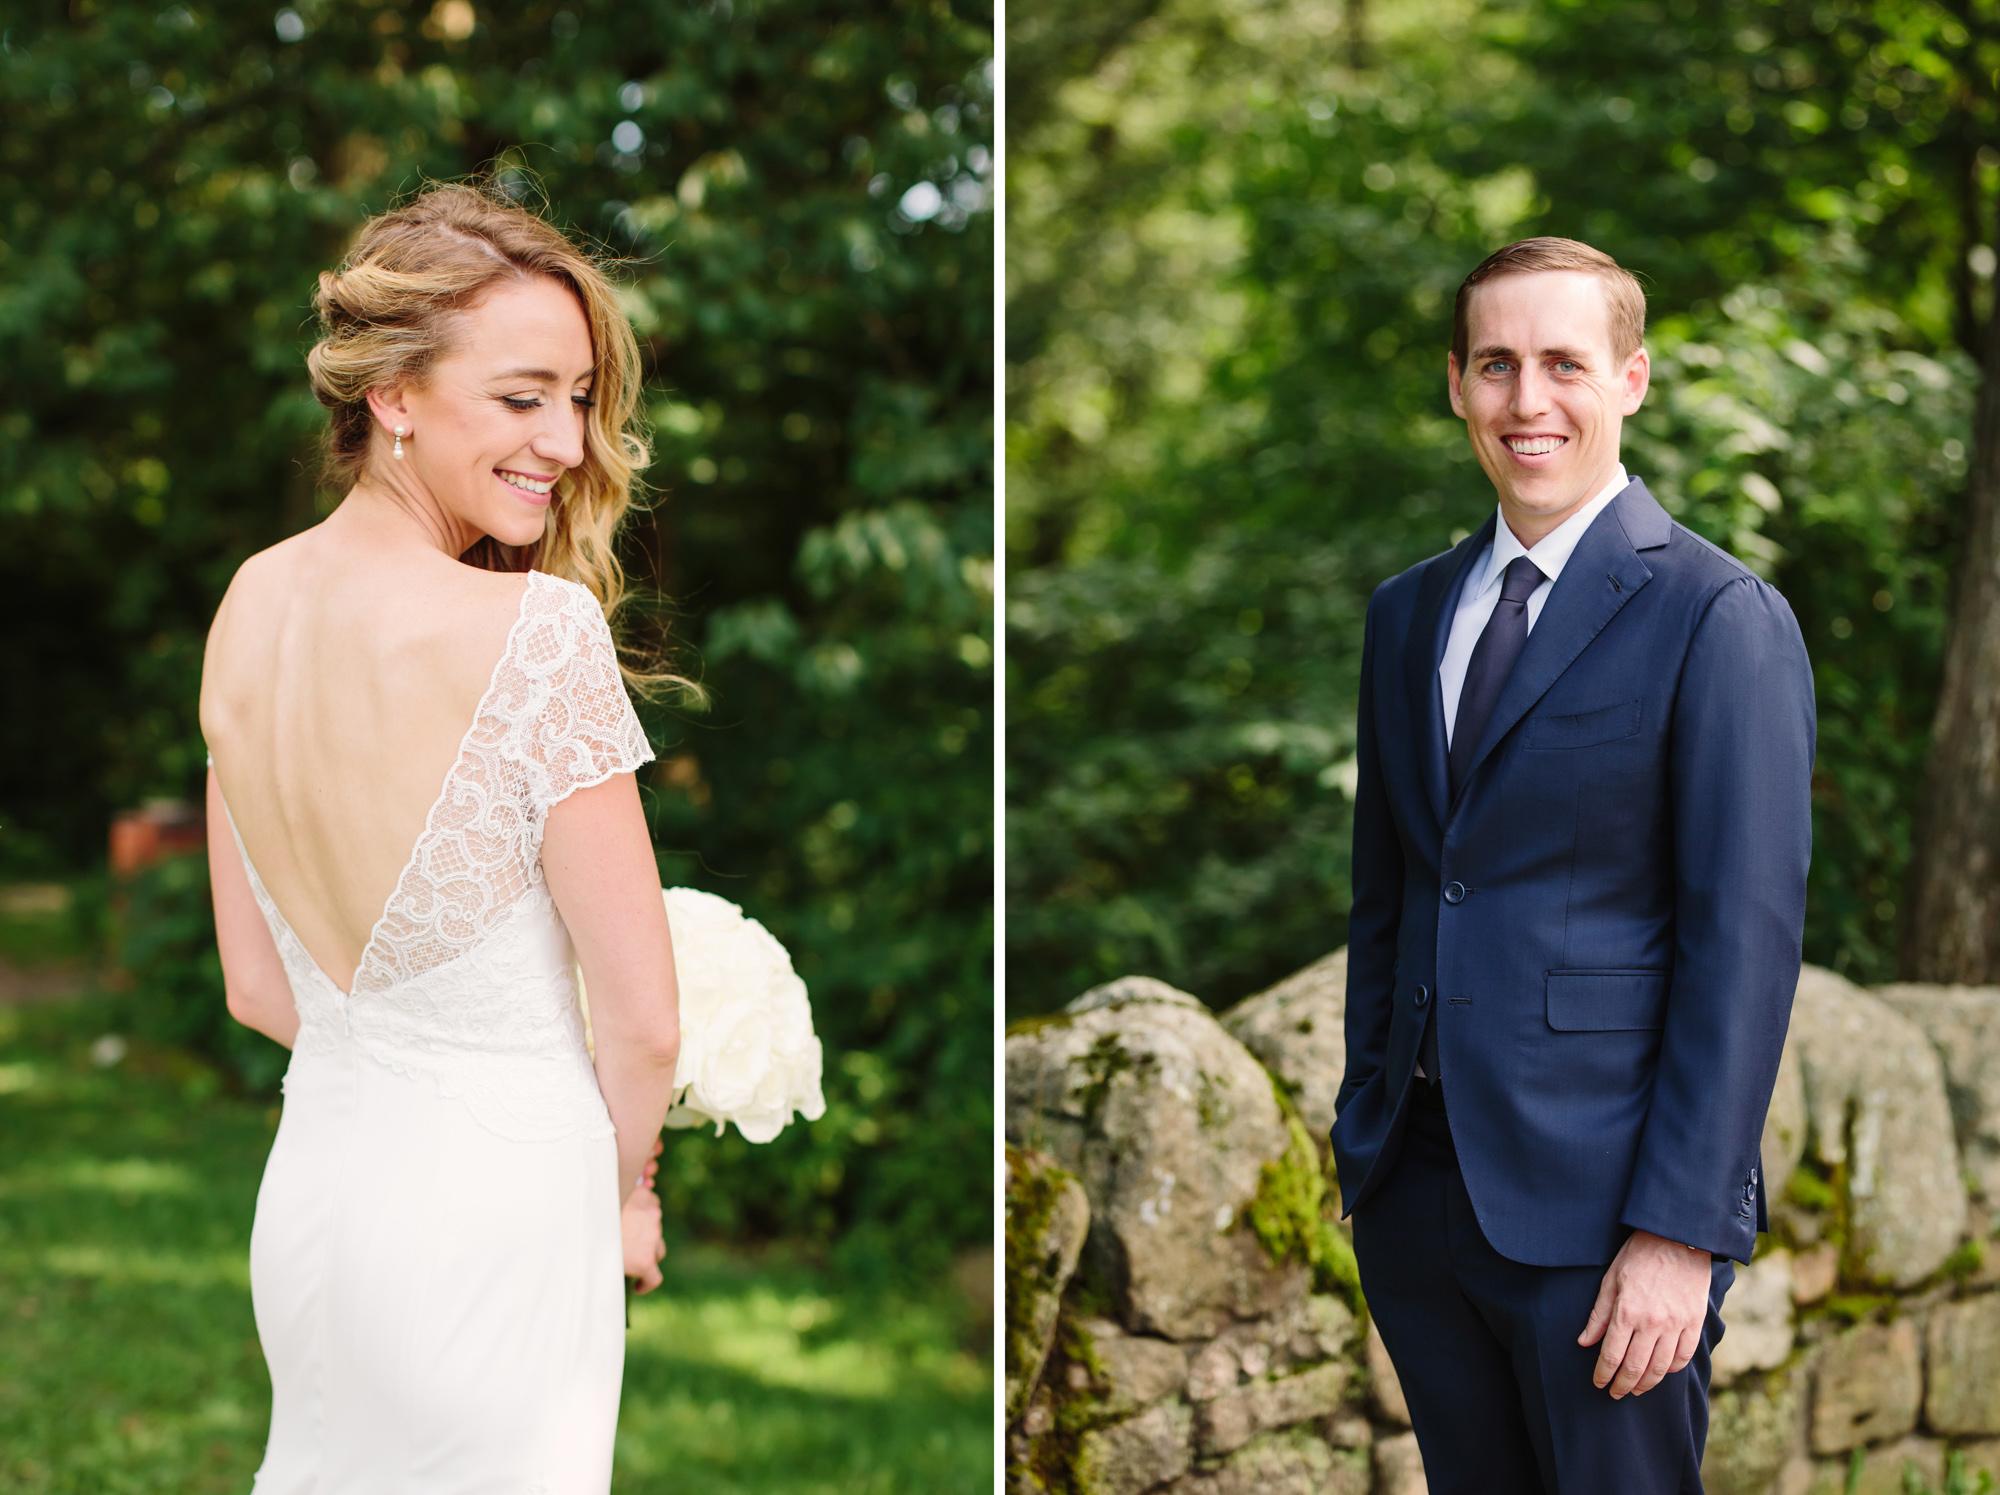 22_Jessica_Ted_Blue_Hill_Stone_Barns_Wedding_Pocantico_NY_Tanya_Salazar_Photography.jpg